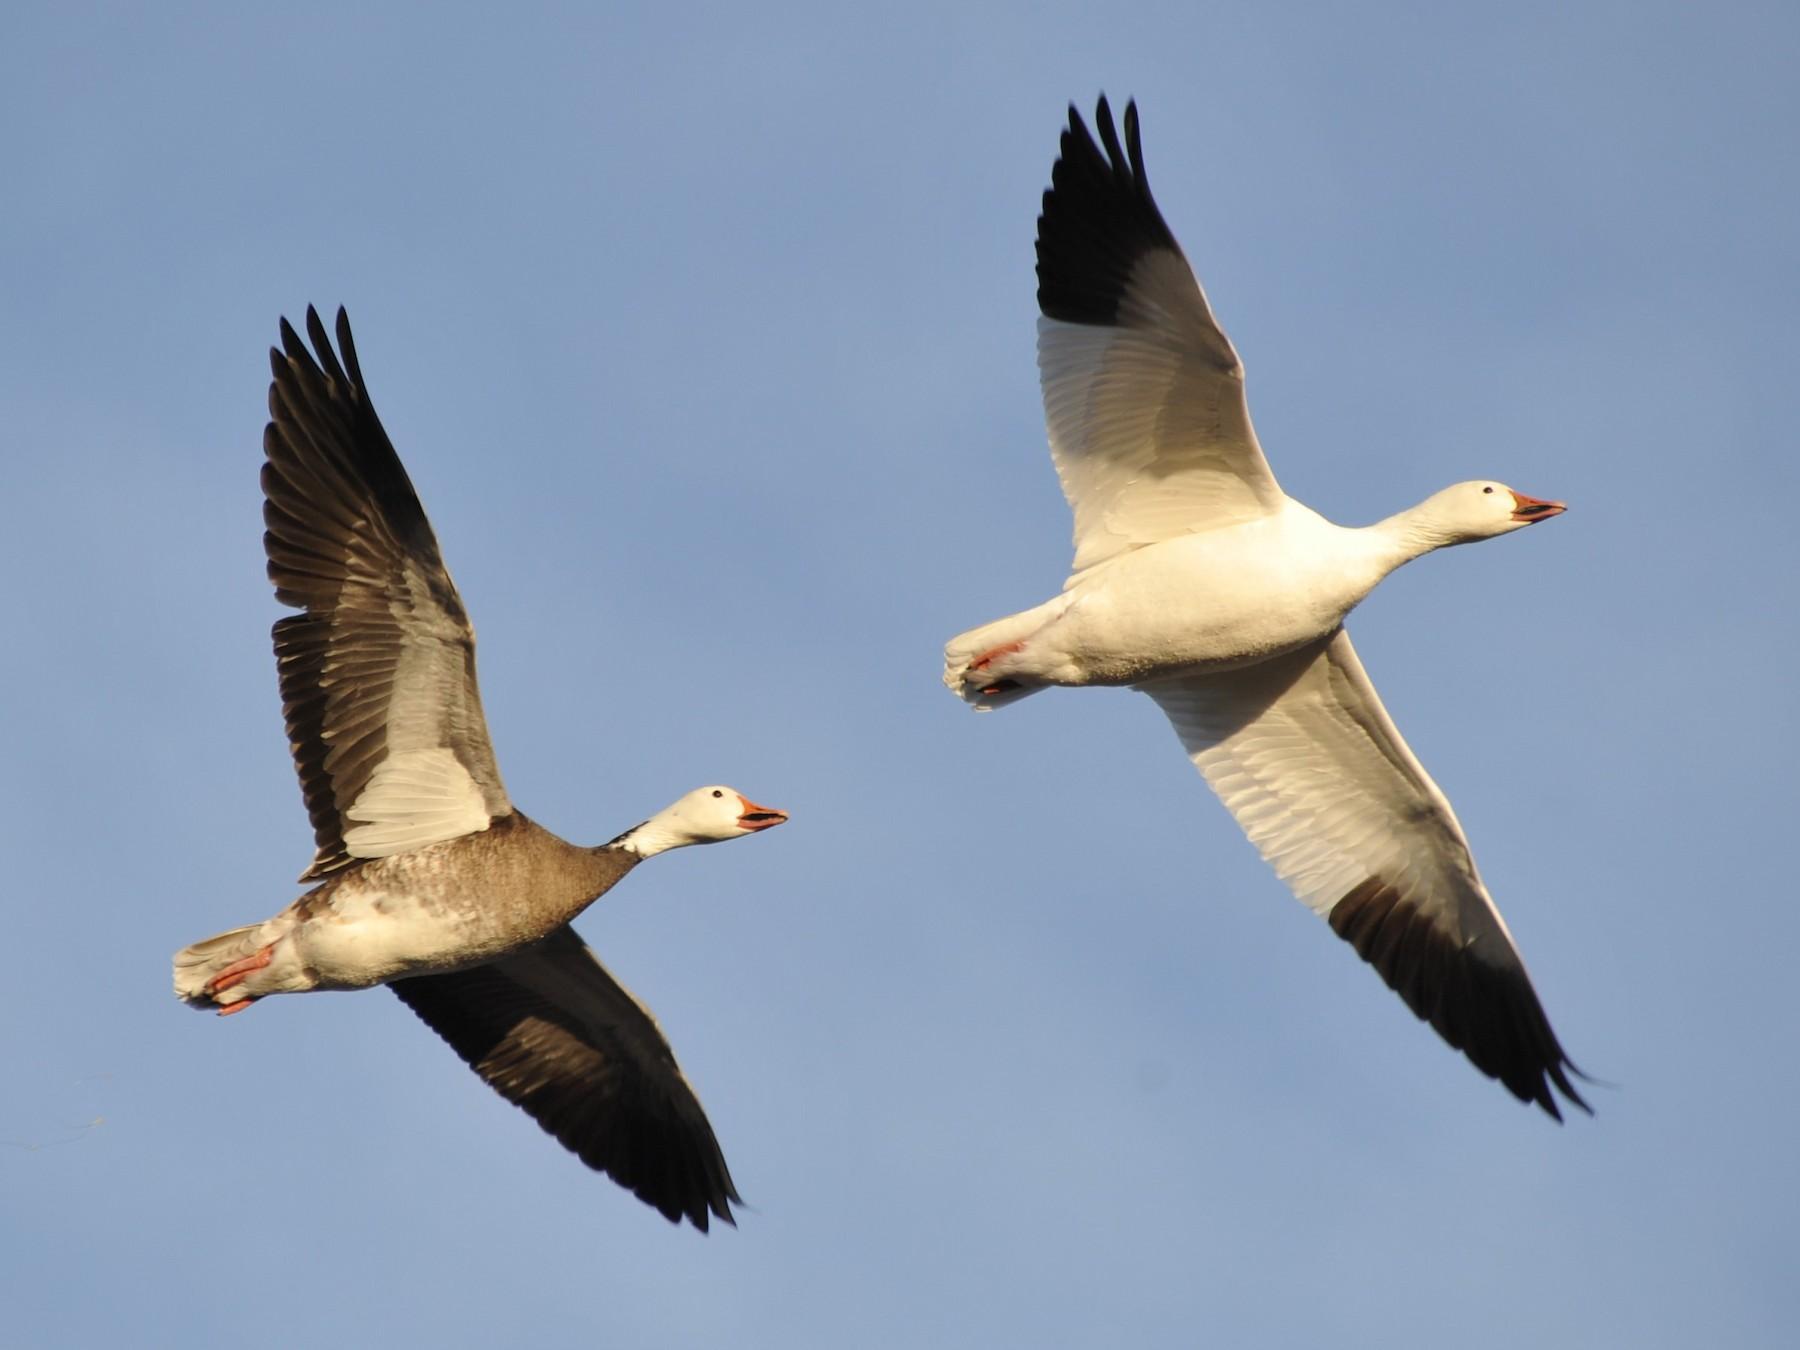 Snow Goose - Martina Nordstrand